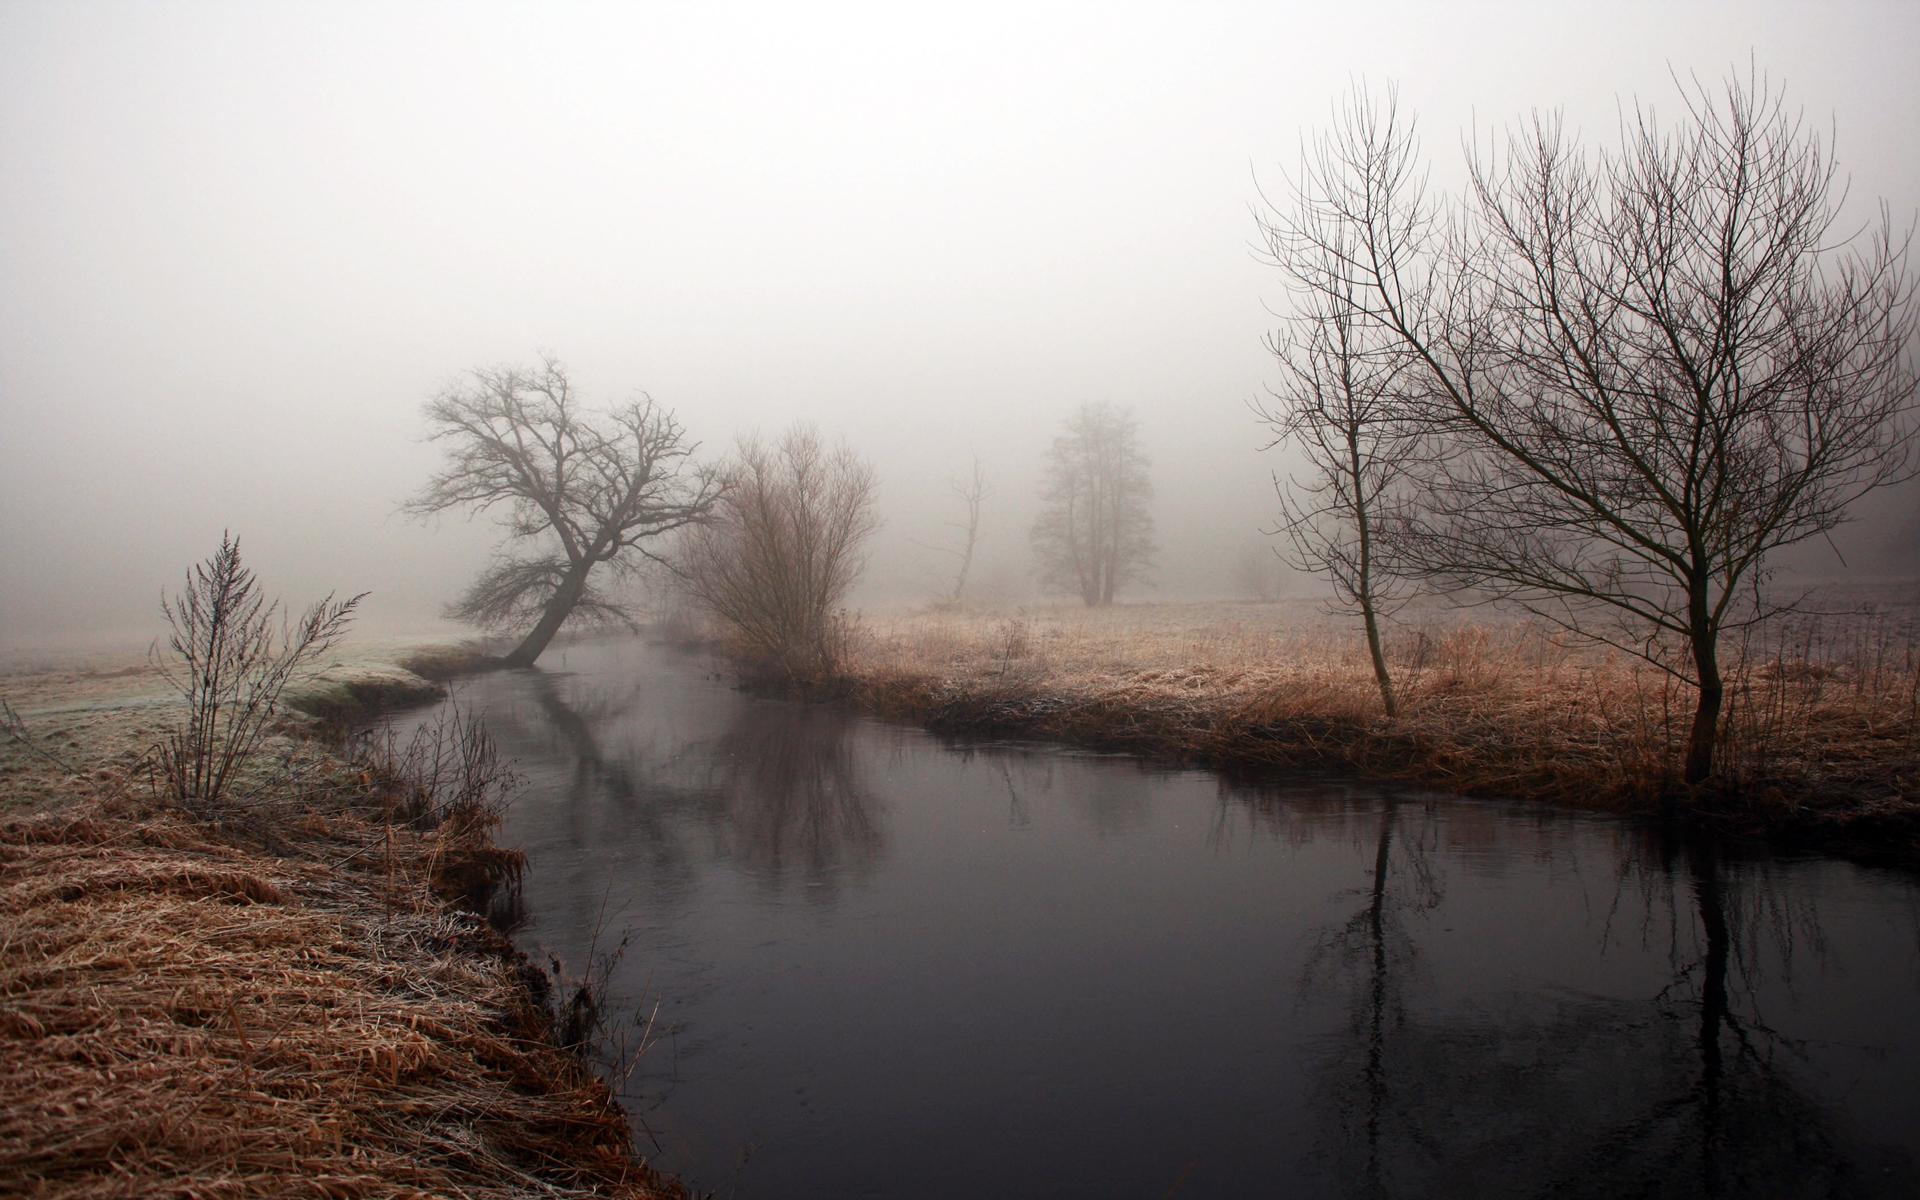 landscapes trees fog - photo #18